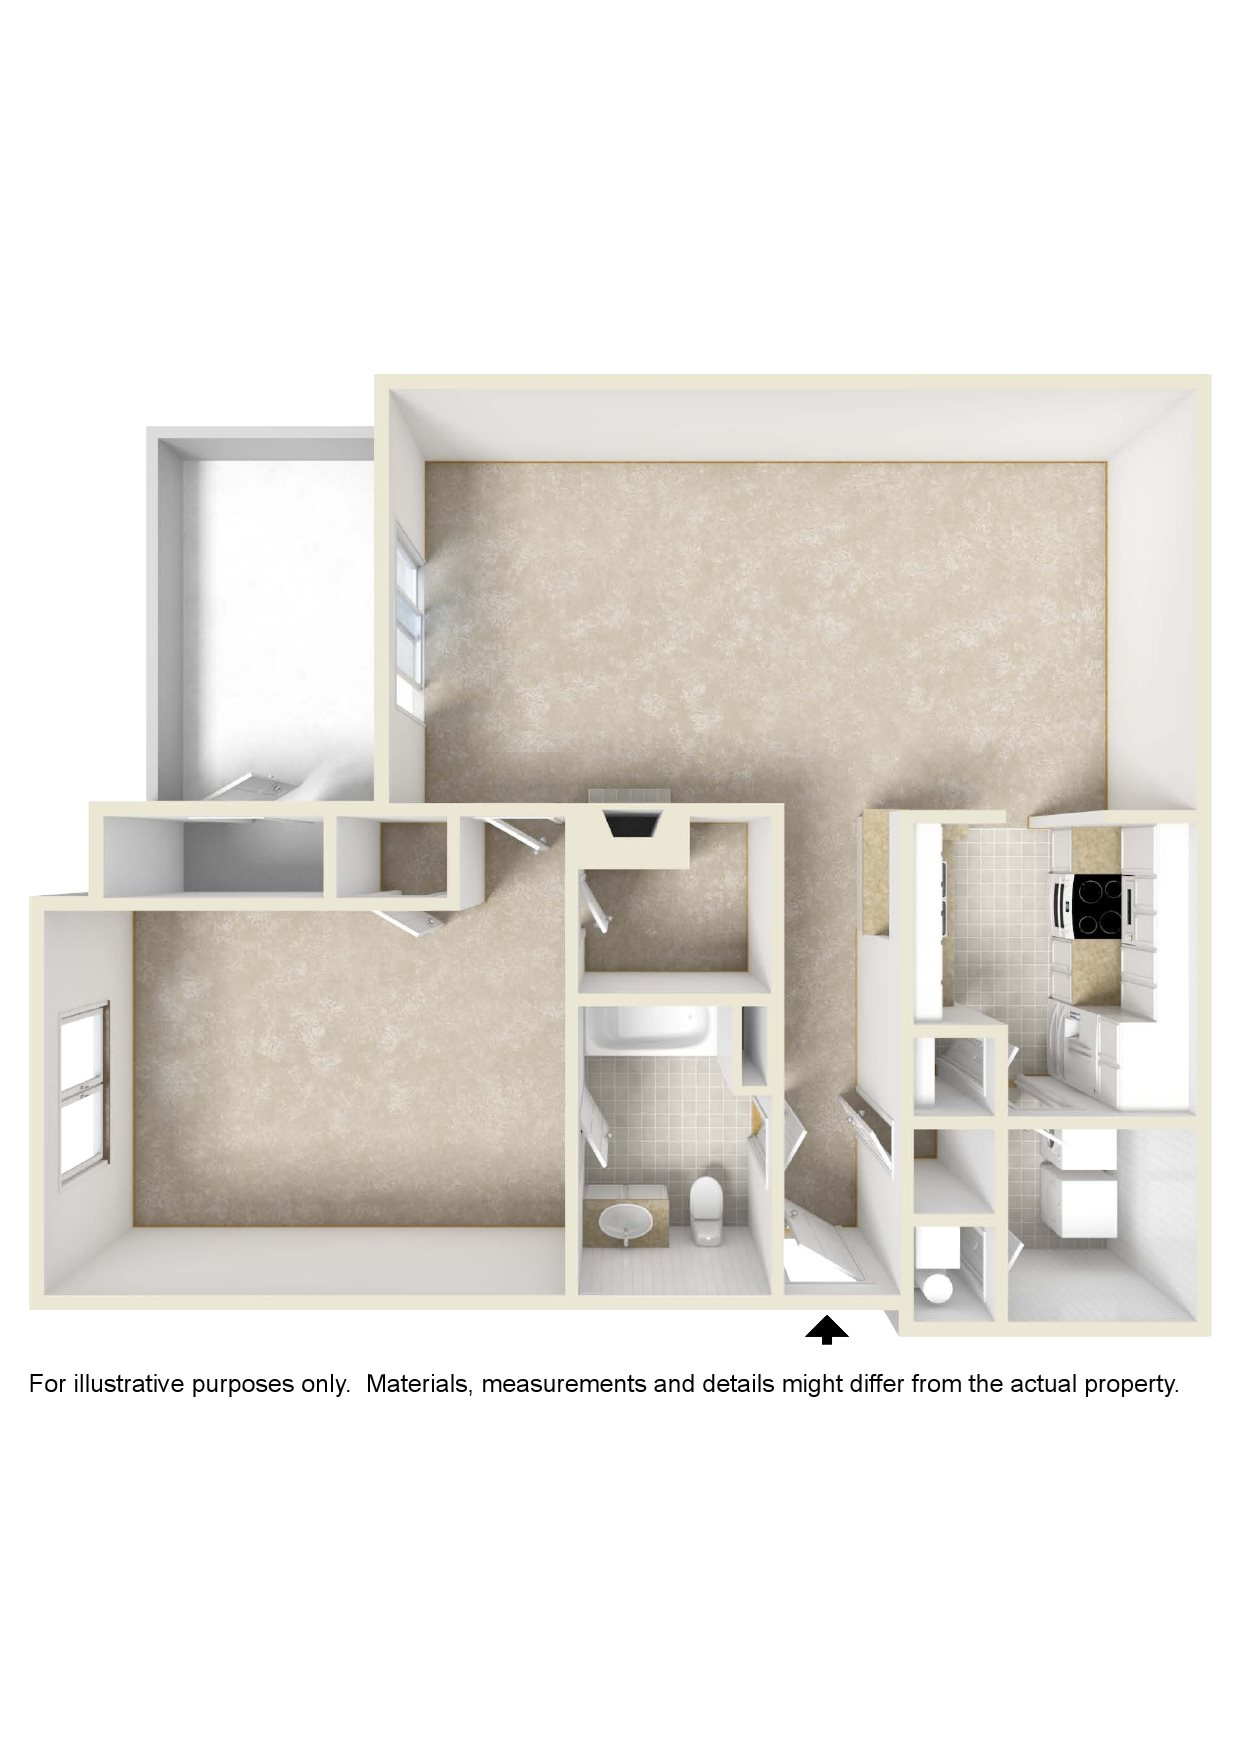 The Cayman Floor Plan 1